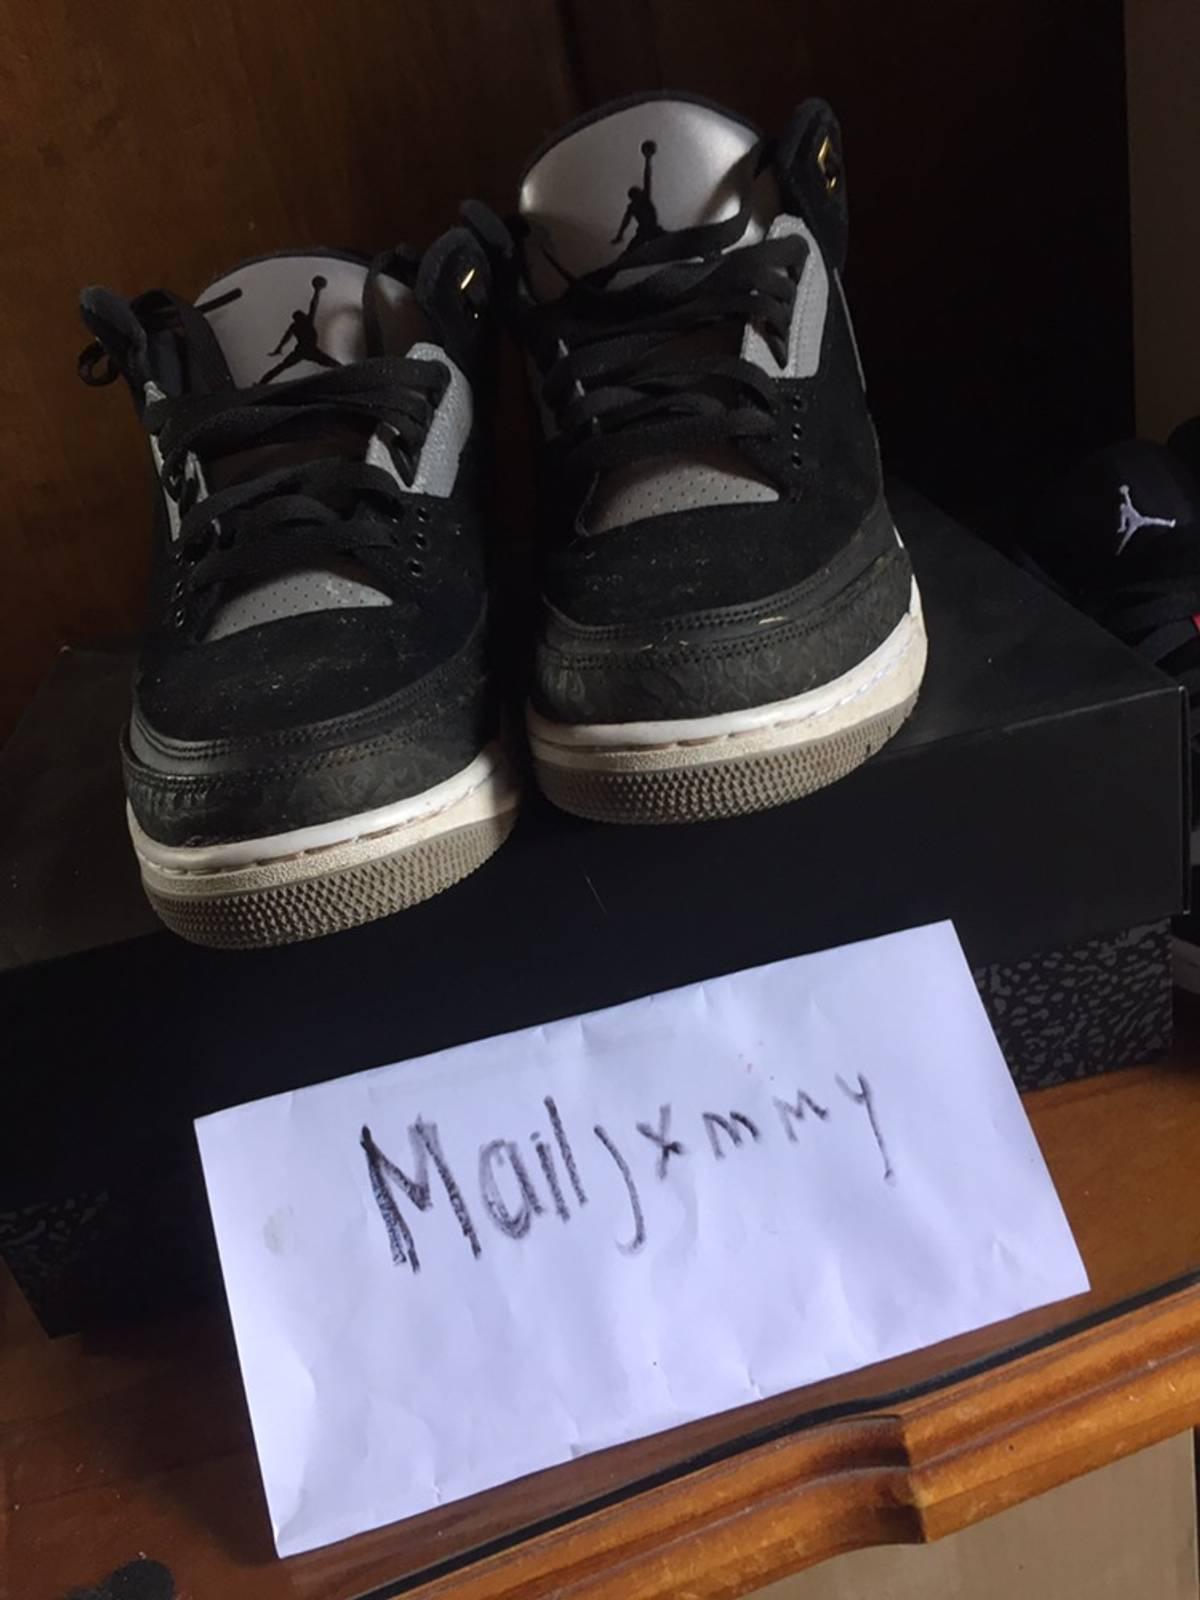 Jordan Brand × Nike Air Jordan 3 Retro Tinker Sp Black Cement Size 11 $101